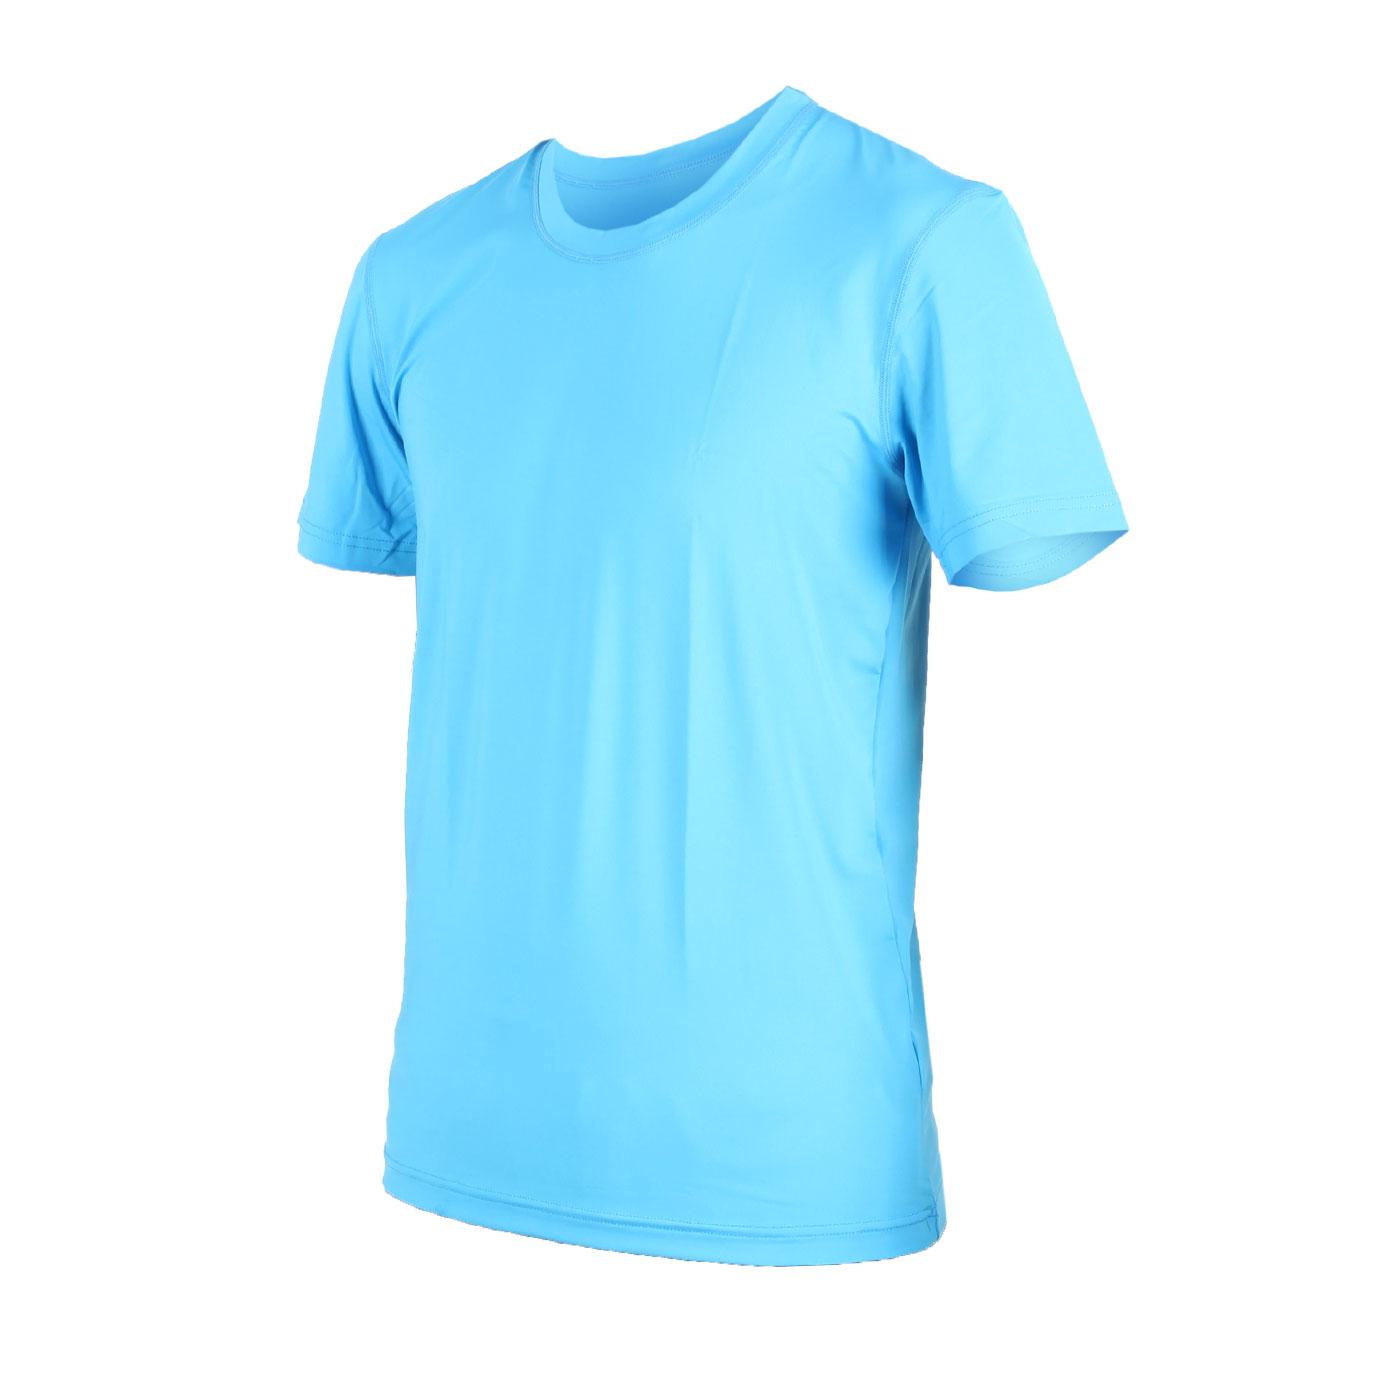 HODARLA 男女-無懈可擊輕彈機能服 3138801 - 亮藍